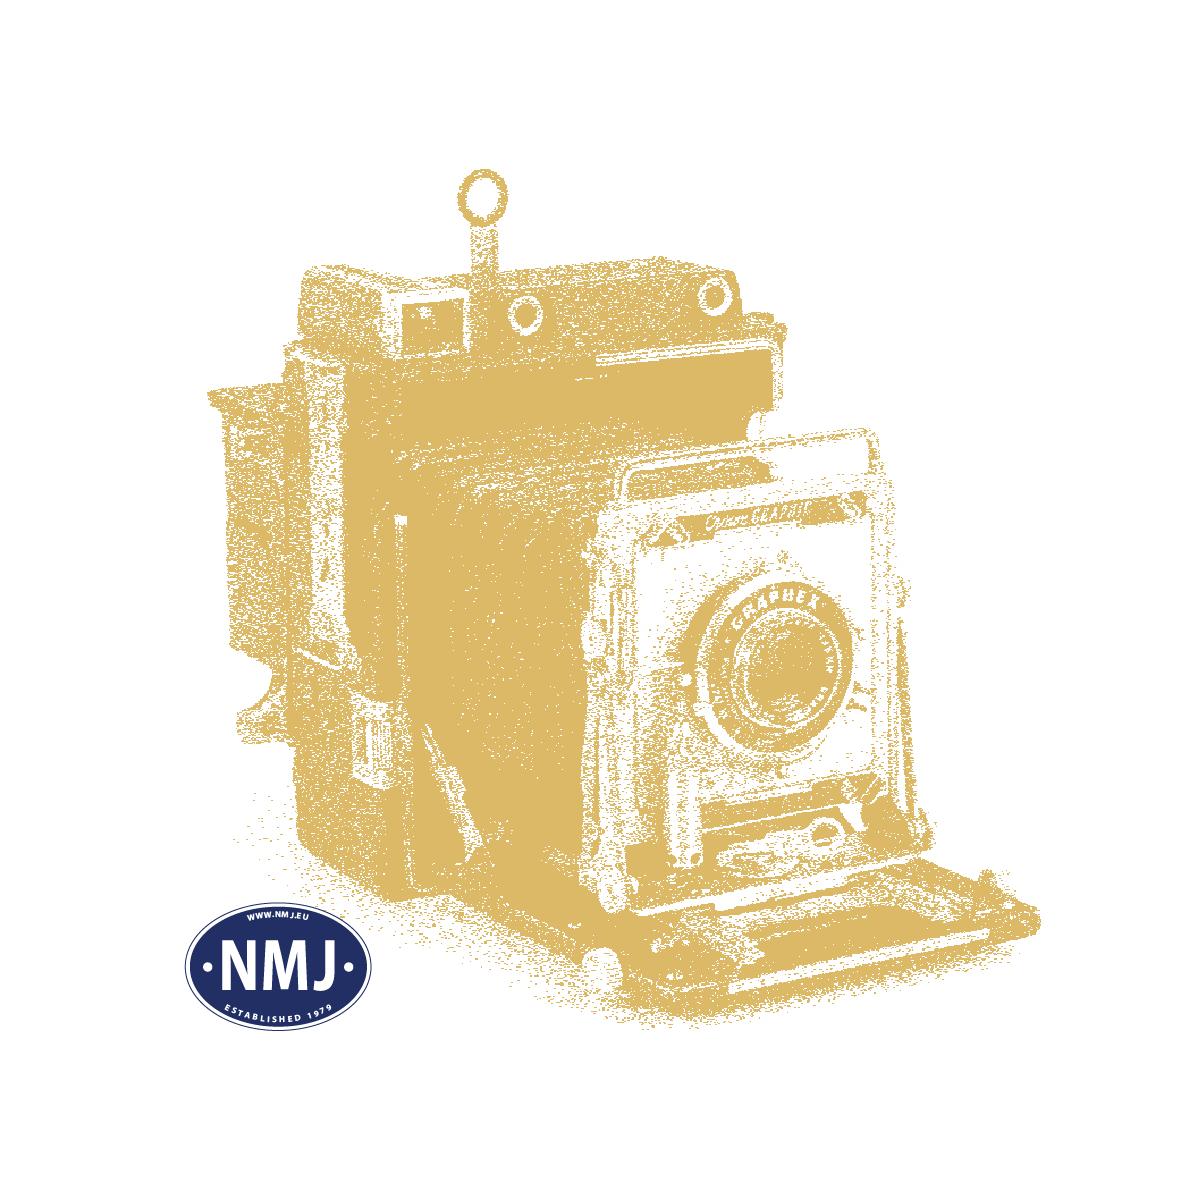 TOM02070313 - DCC Digital Lyslist, 14 Lysdioder, Varmhvit, 275 mm